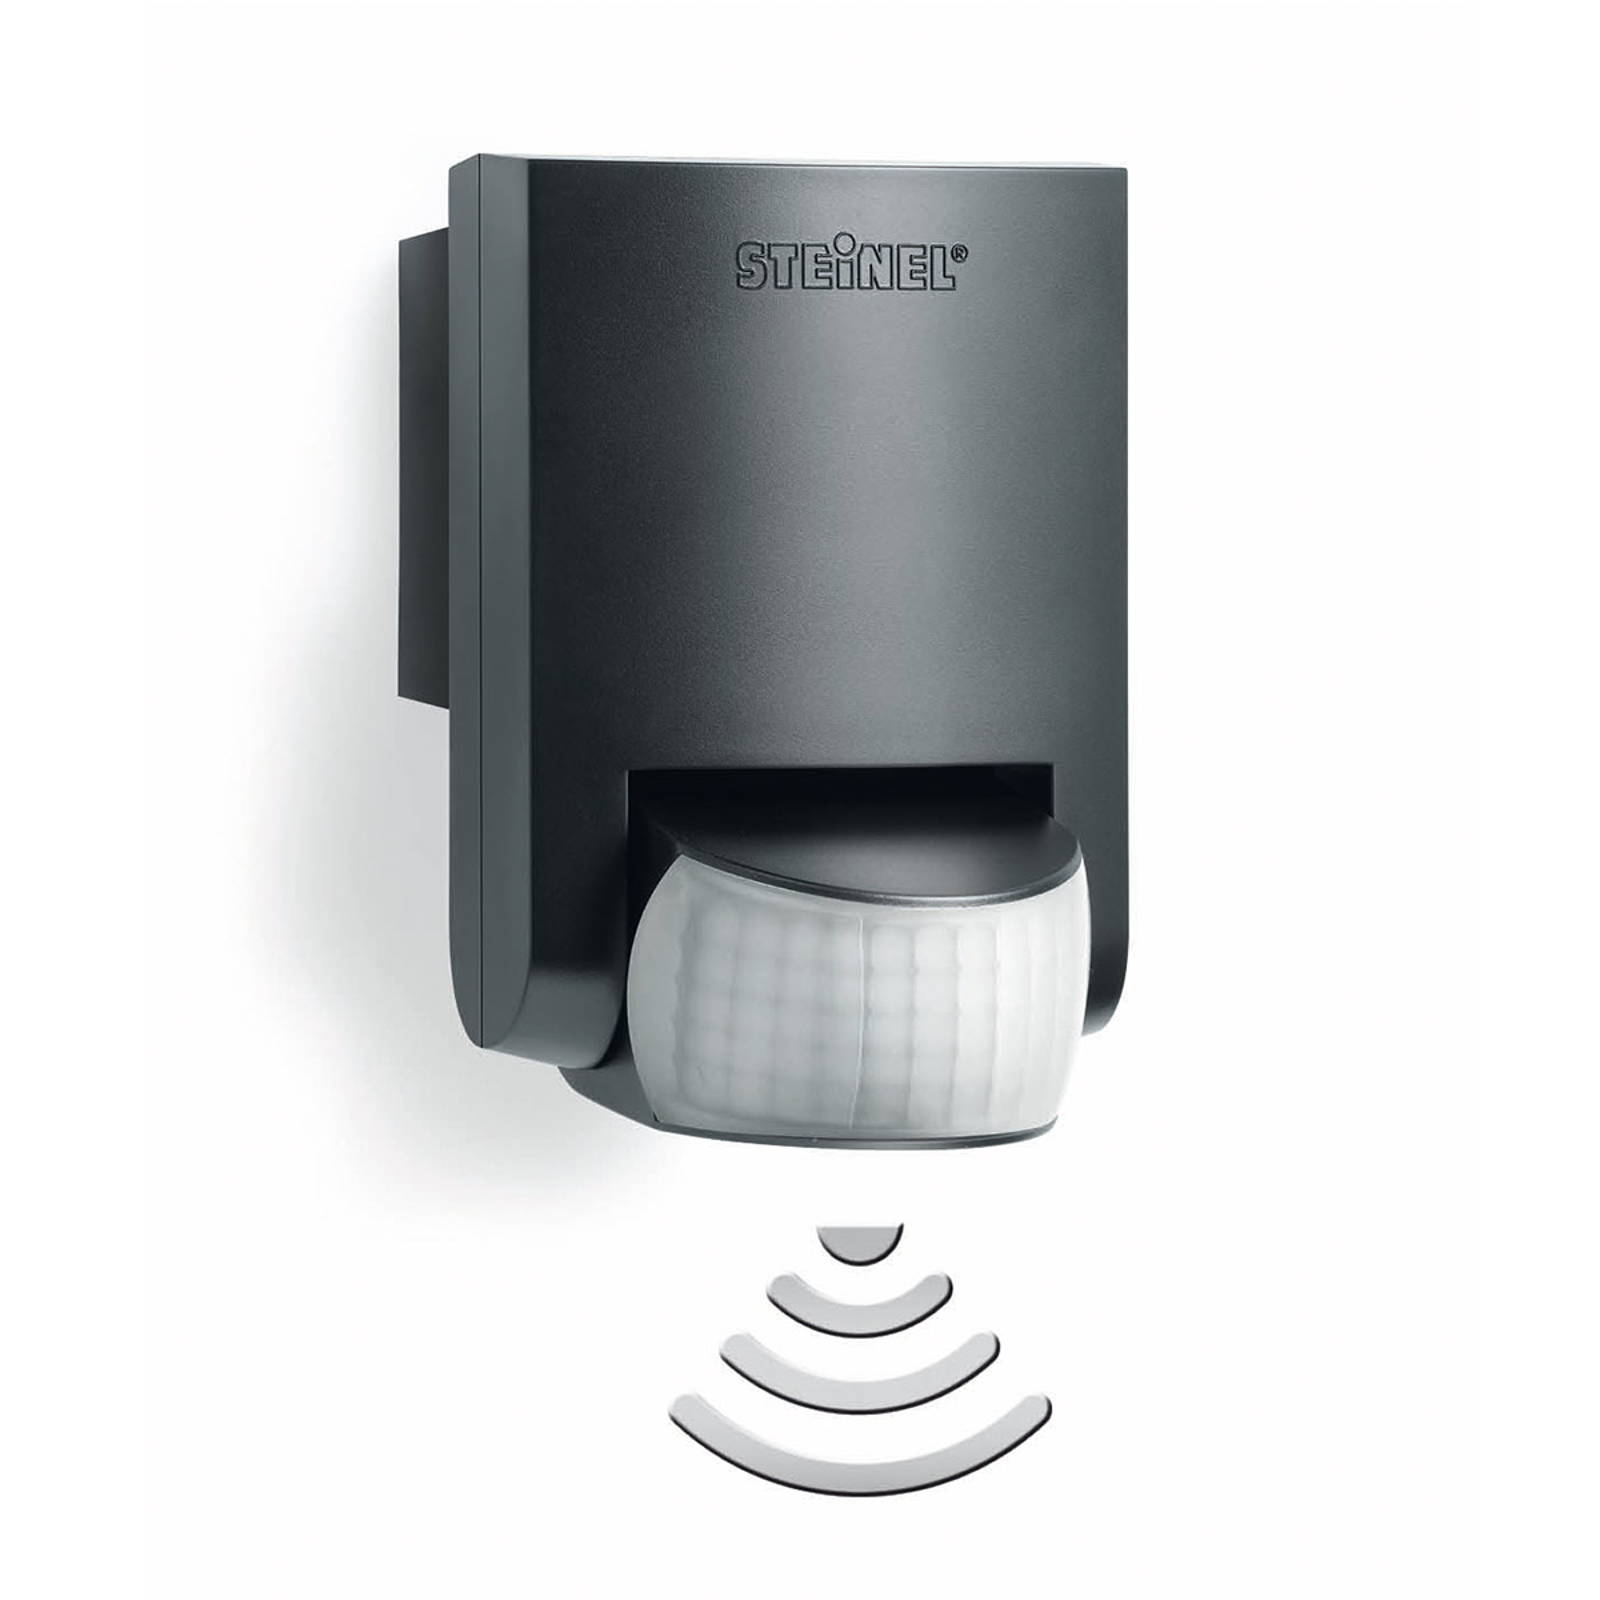 STEINEL sensor IS 130-2 i svart